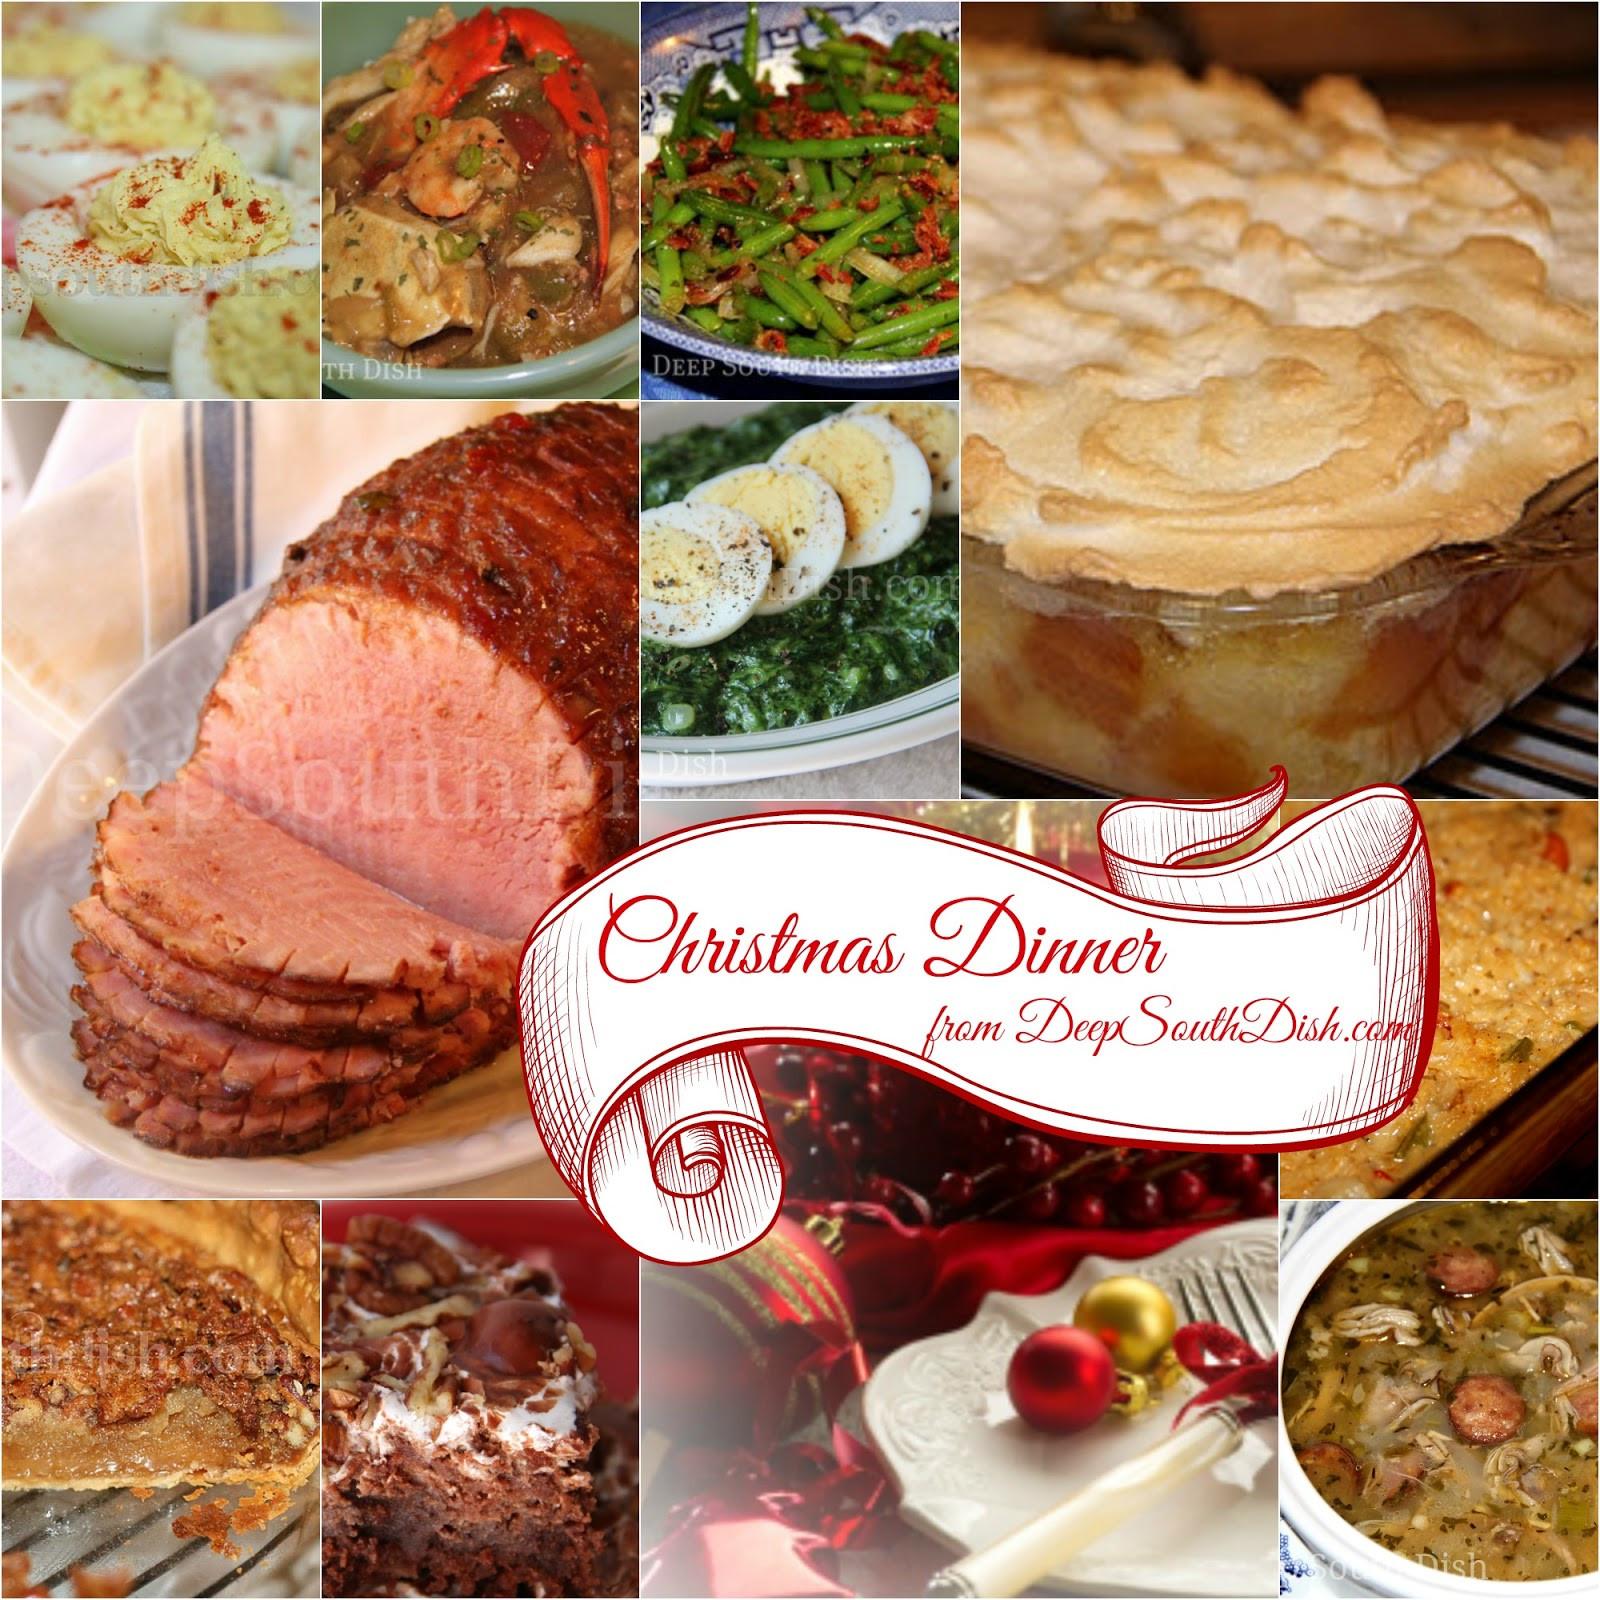 Soul Food Christmas Dinner Menu  Deep South Dish Southern Christmas Dinner Menu and Recipe